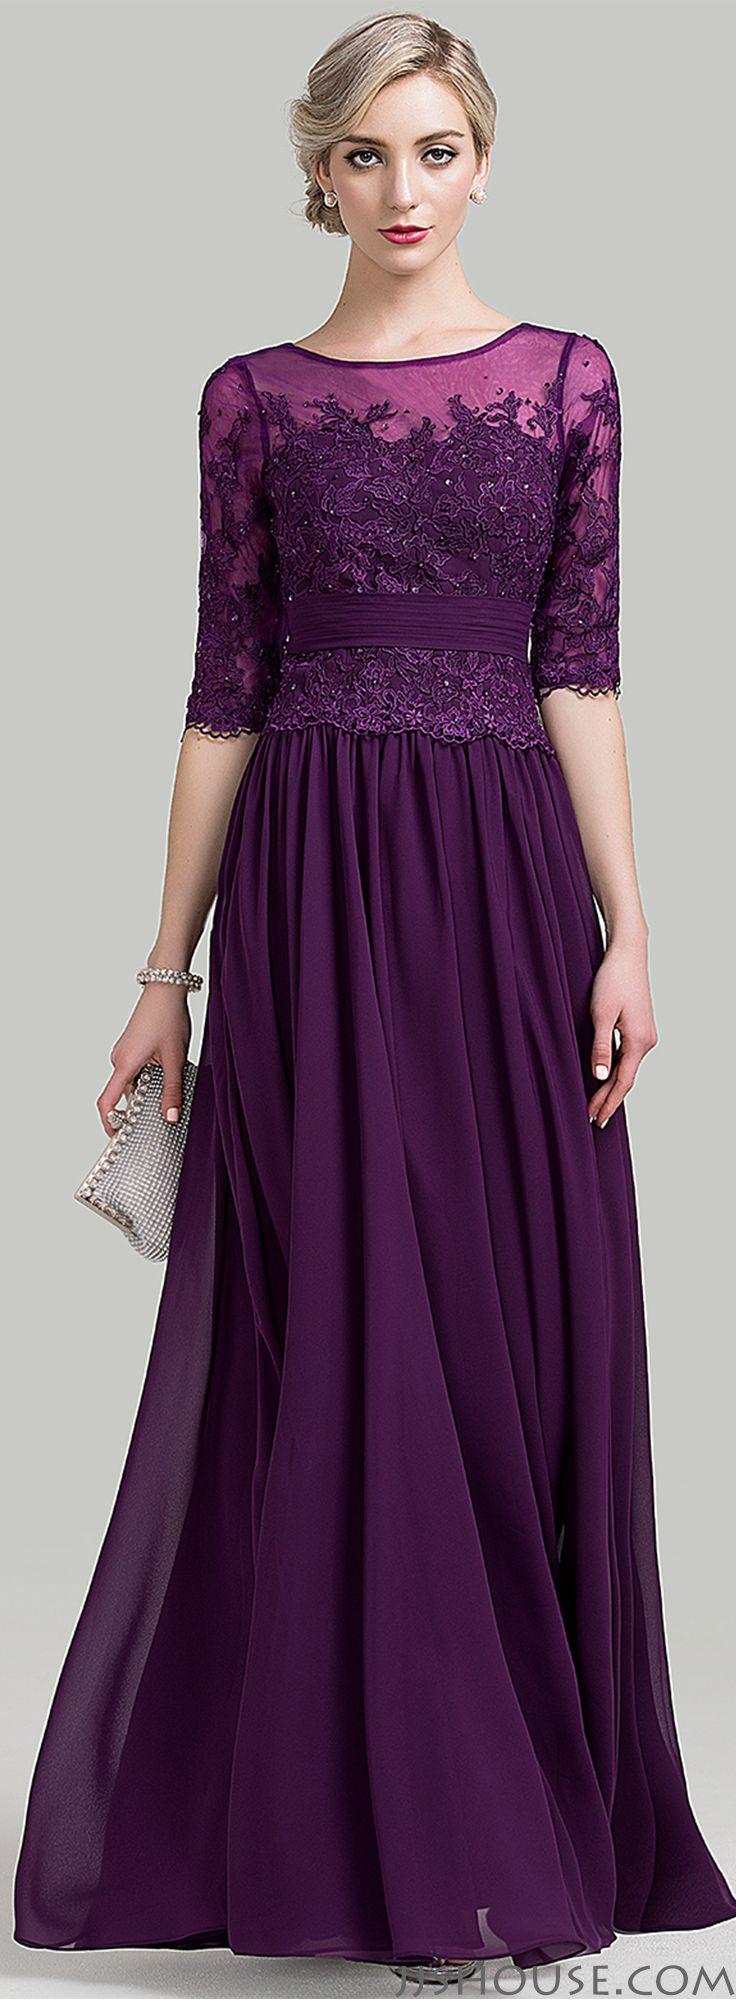 Wedding dress shops in deira dubai  ALinePrincess Scoop Neck FloorLength Chiffon Mother of the Bride